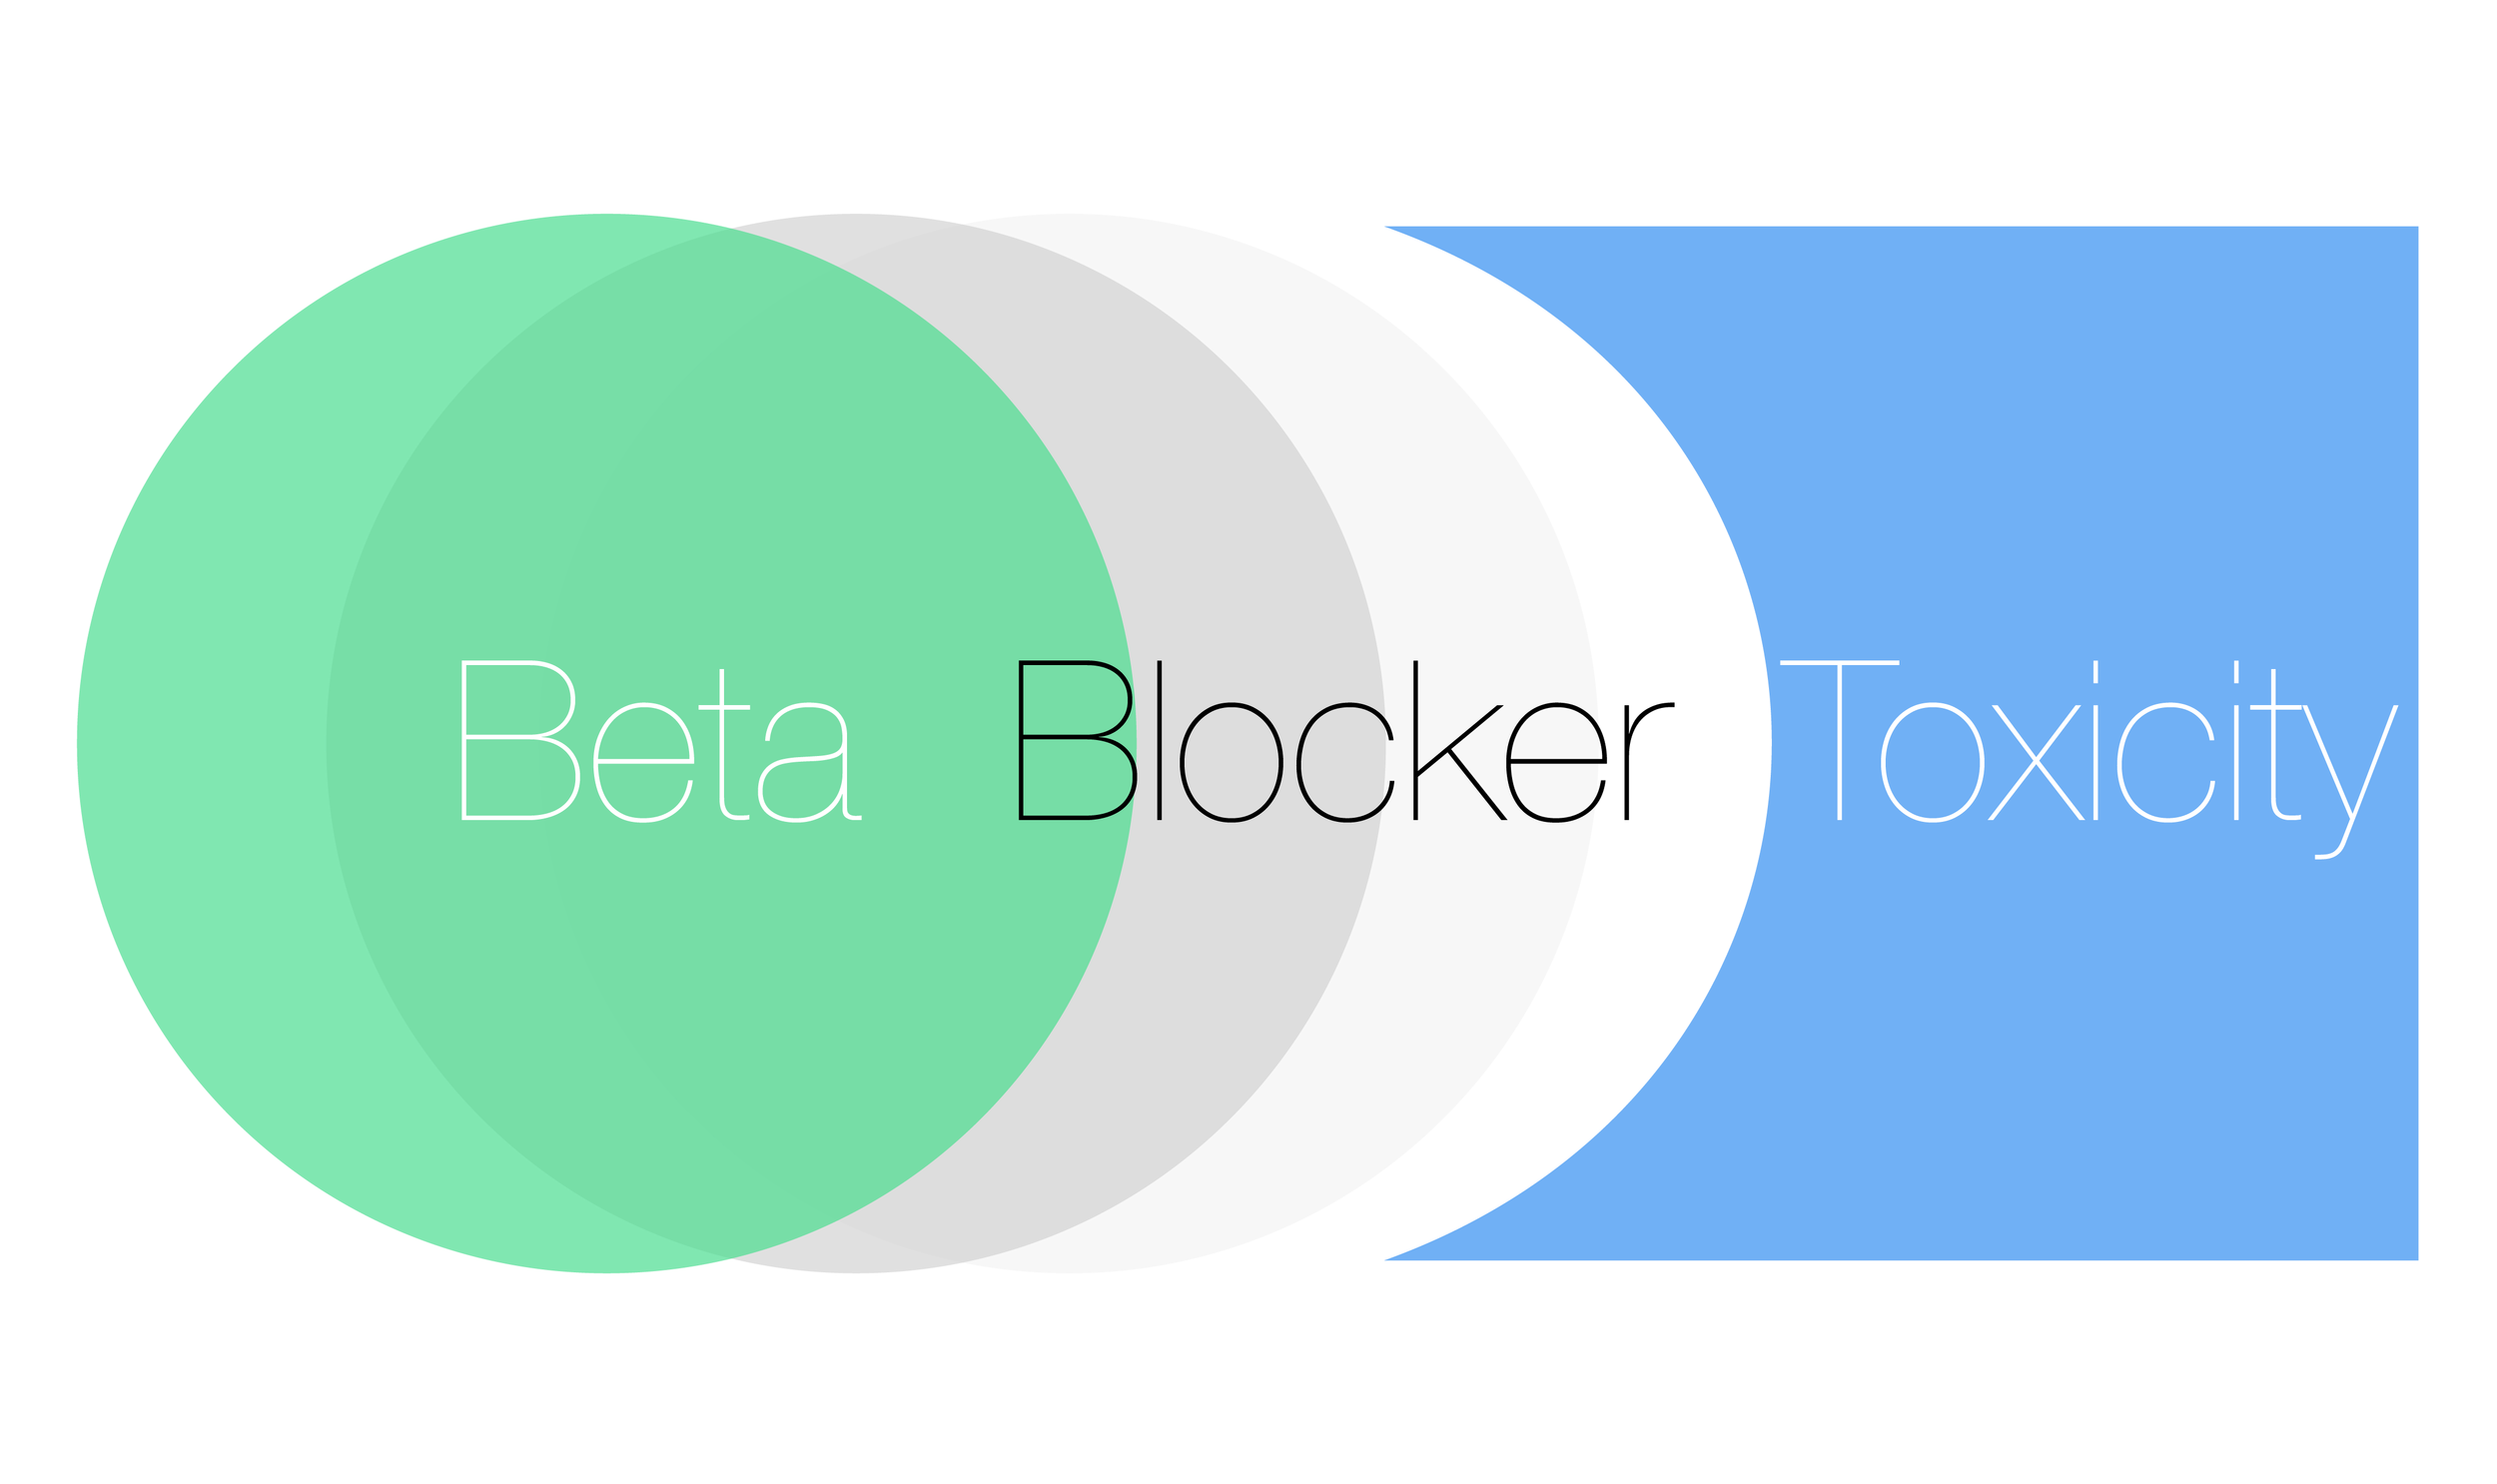 Beta Blocker Toxicity — NUEM Blog